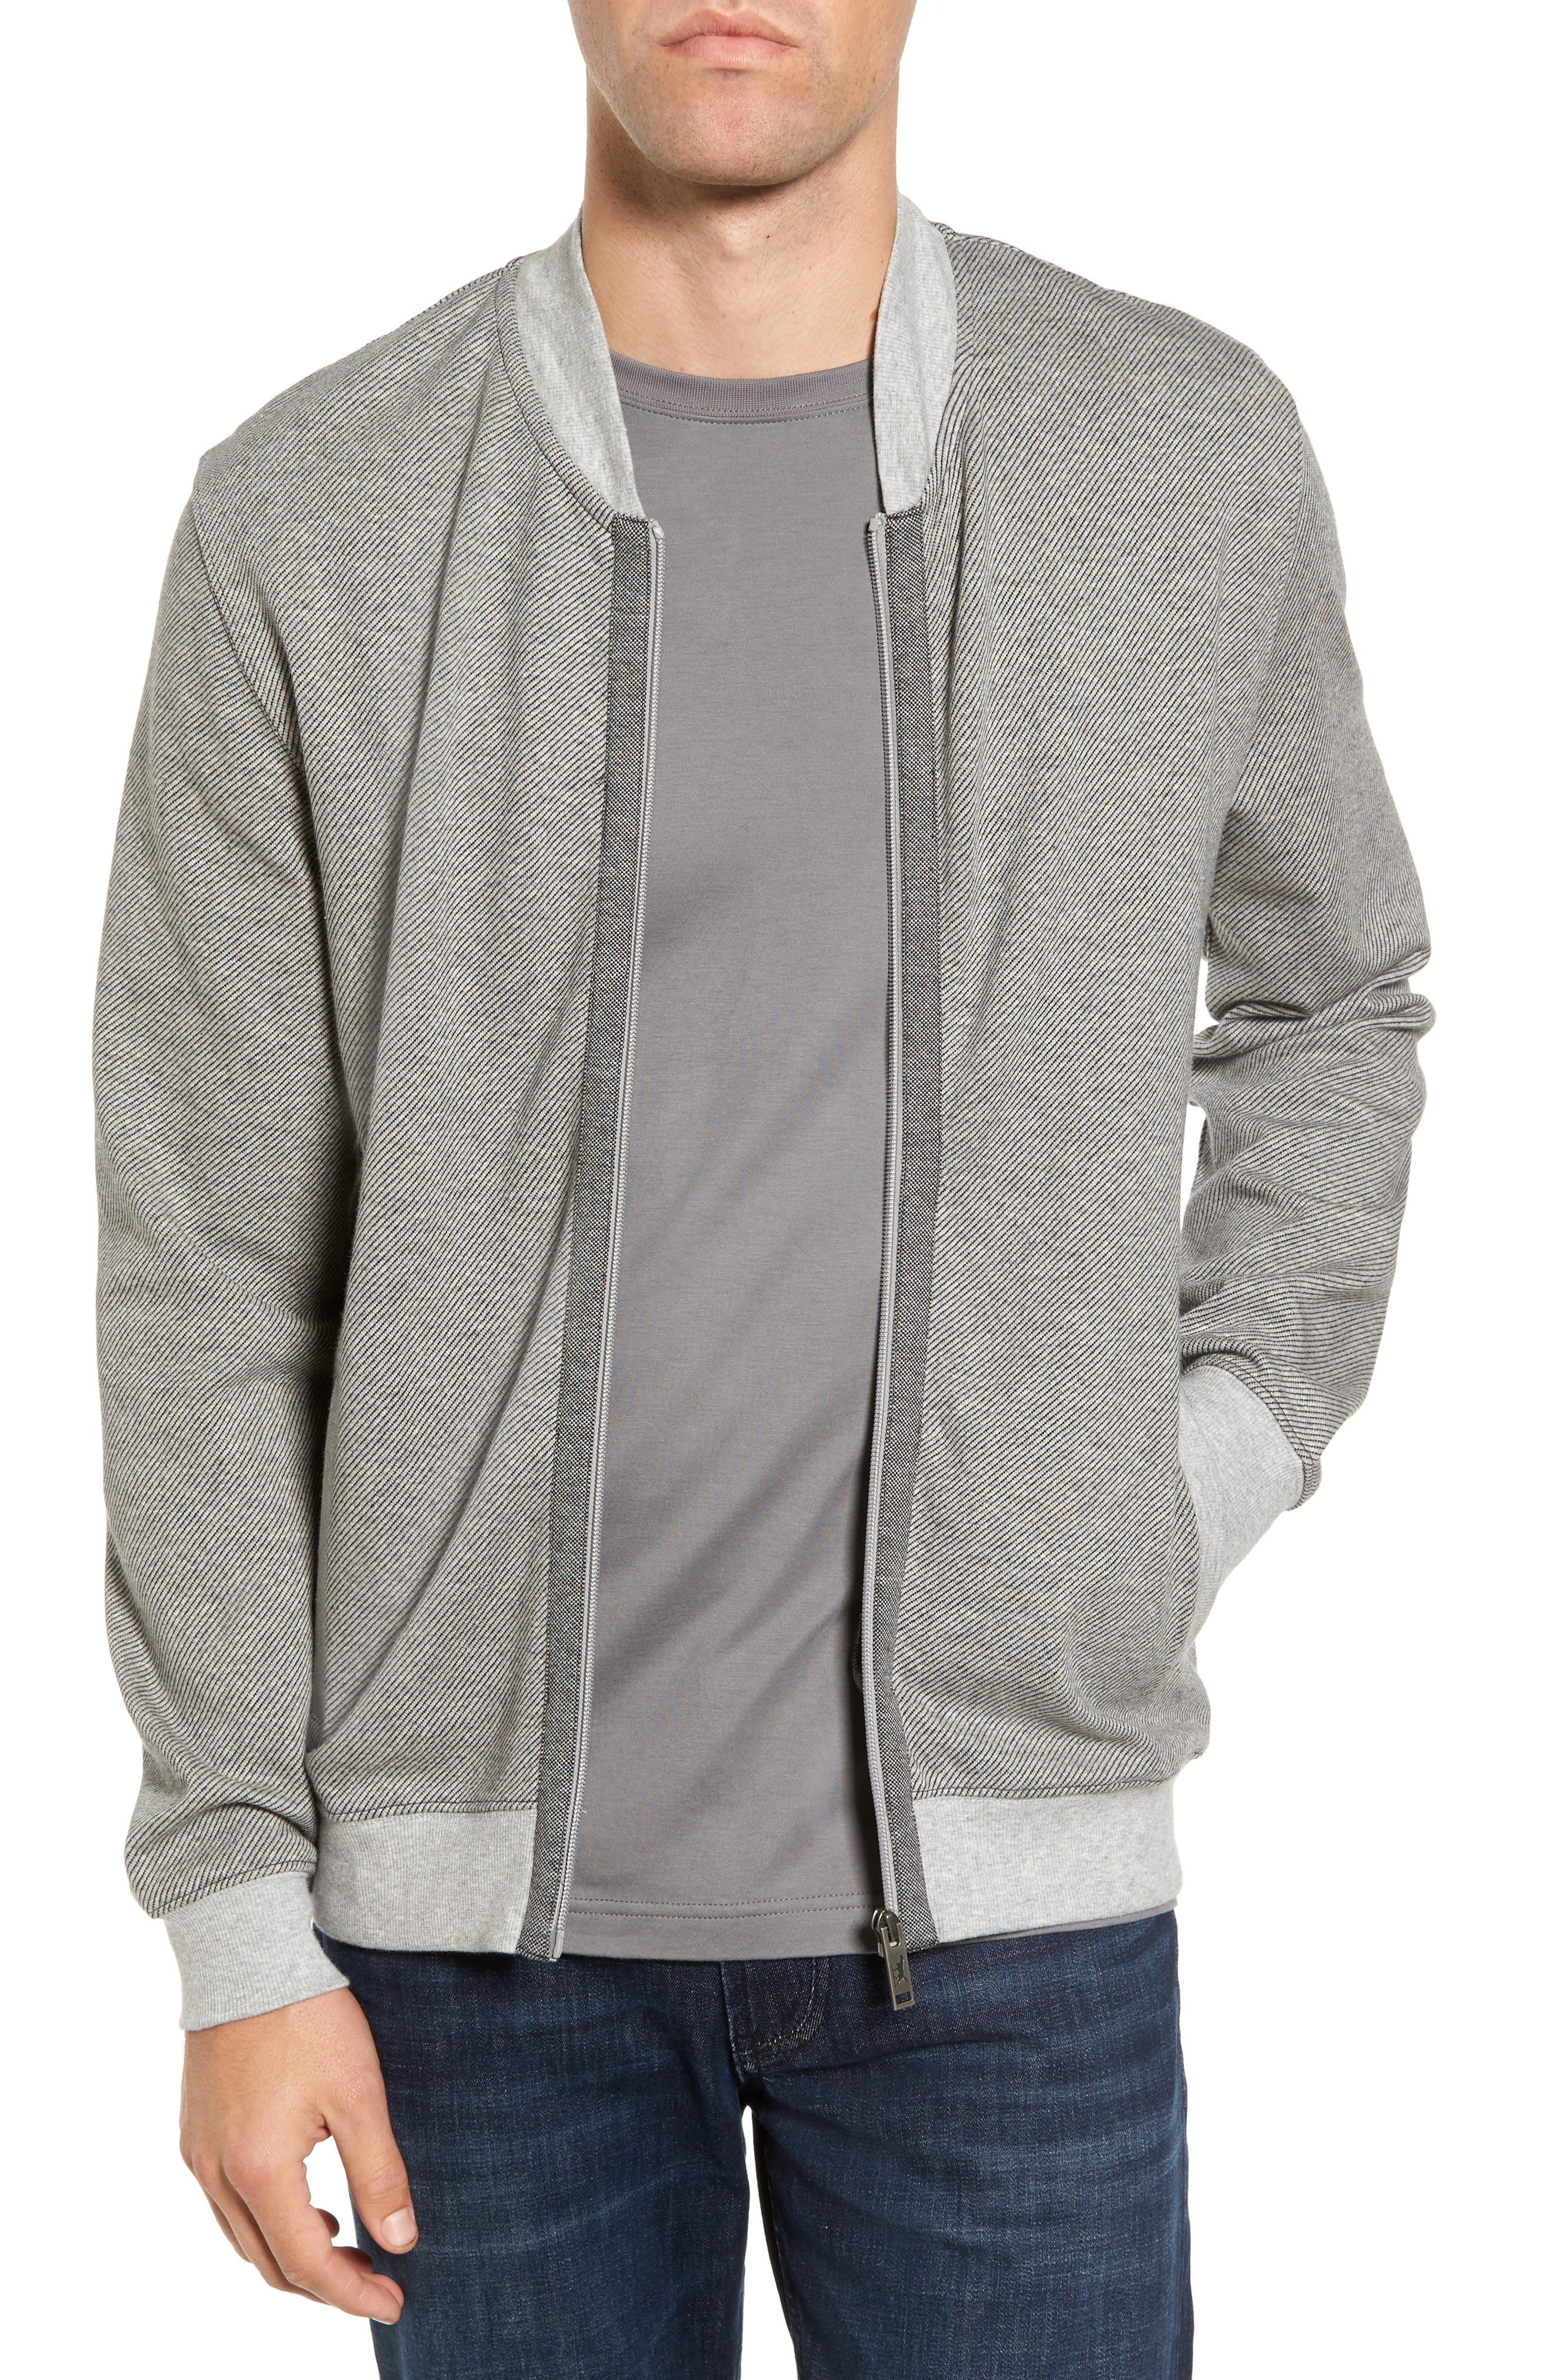 Main Image - Rodd & Gunn Alderson Ave Fleece Jacket